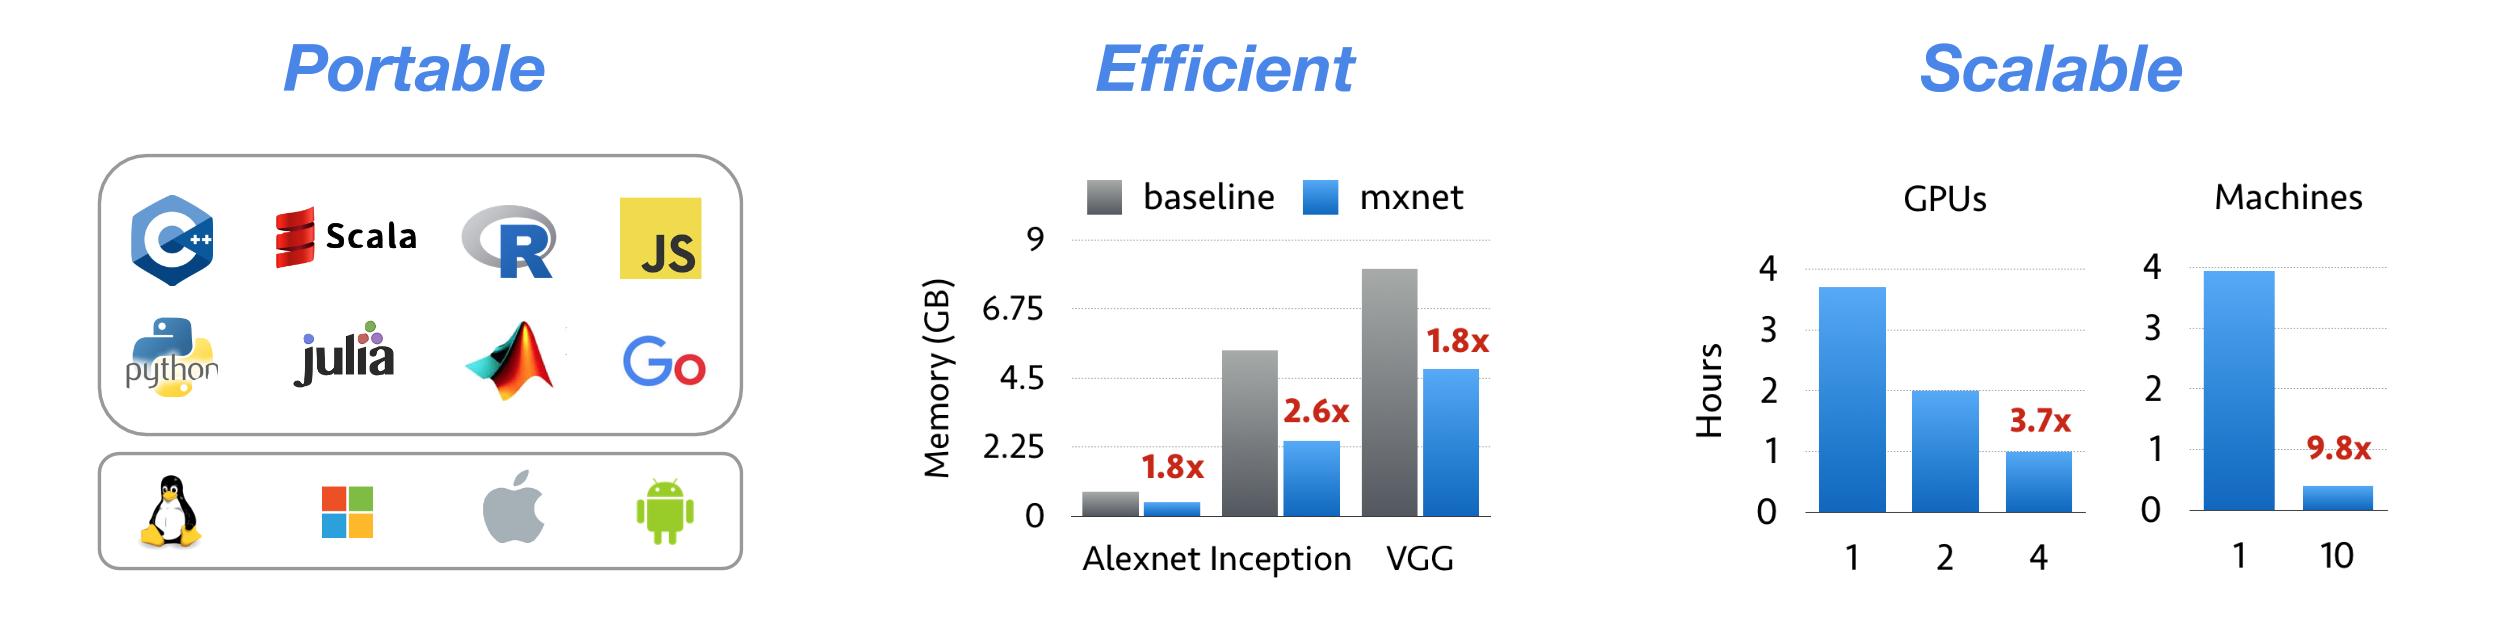 深度学习框架 MXNet 1.1.0(incubating) 发布,改进性能